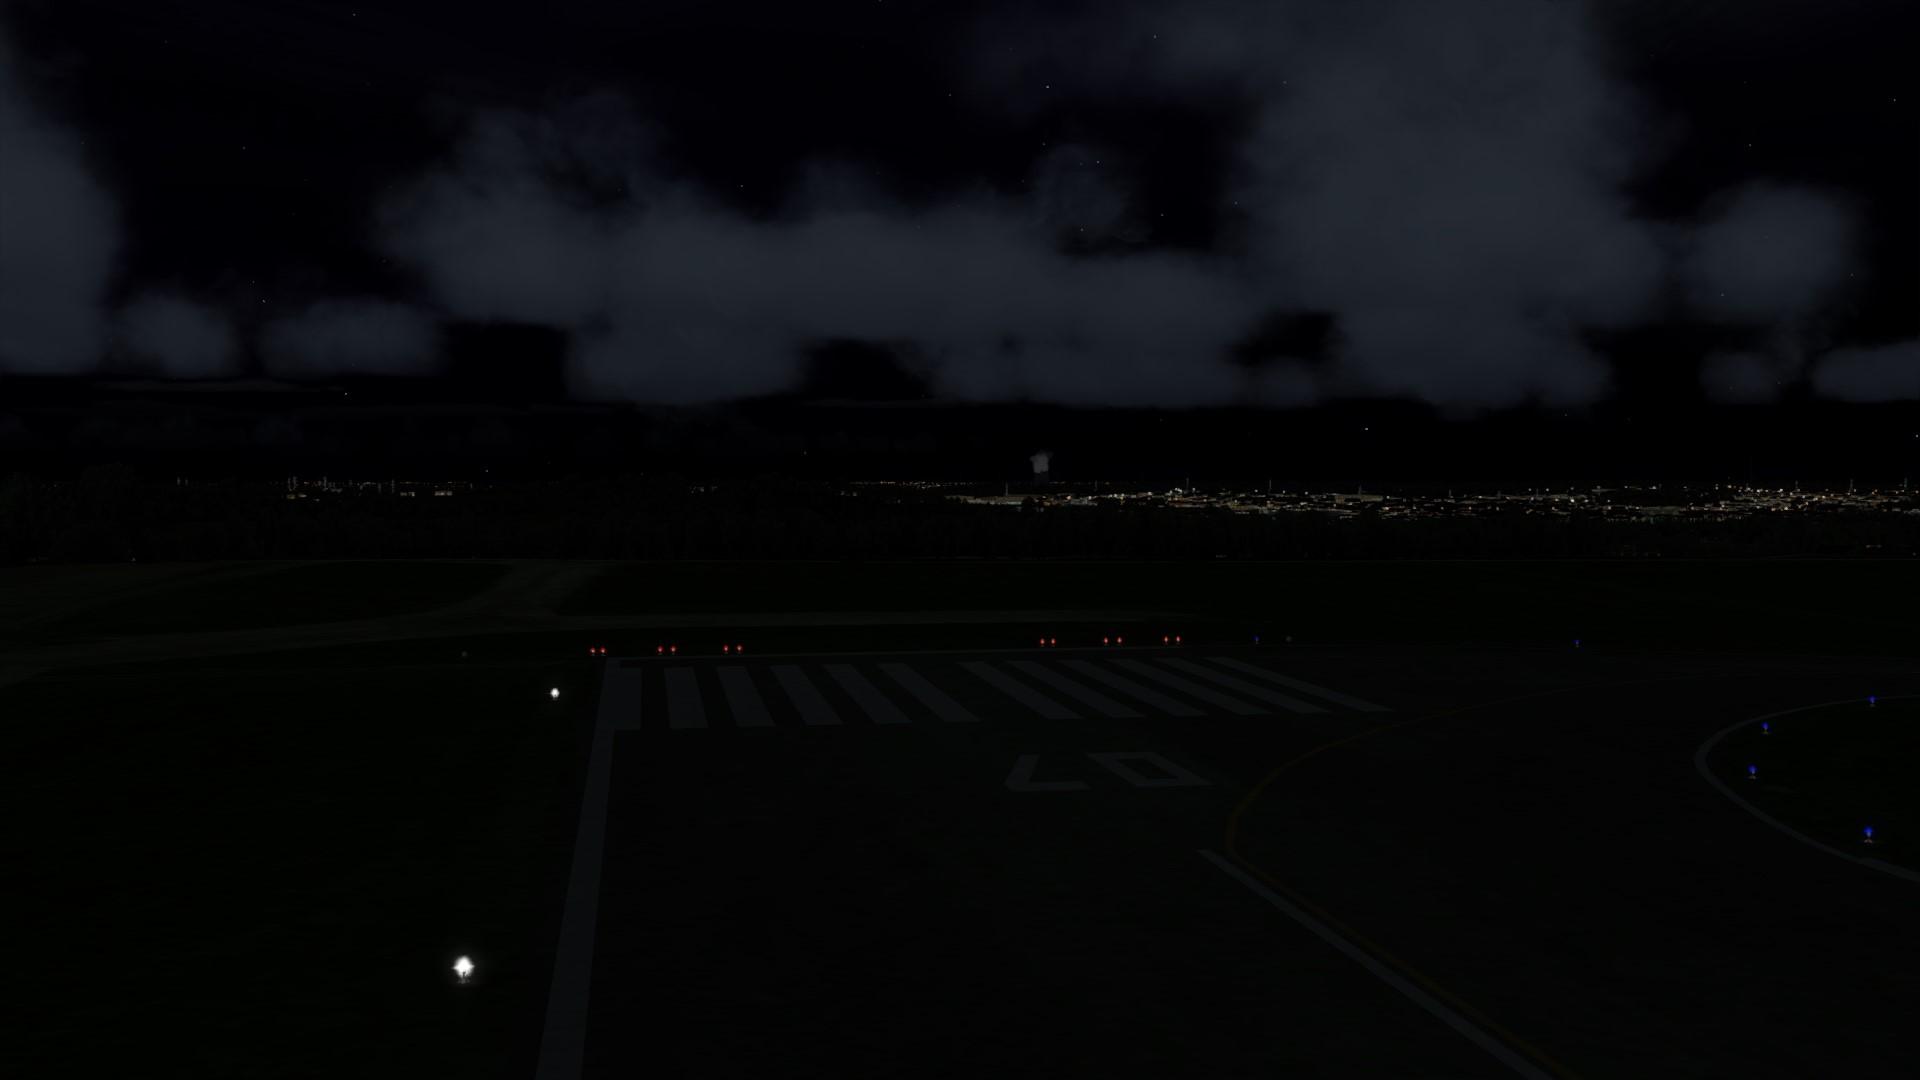 p3dv4_3d_lights_red_lights.jpg